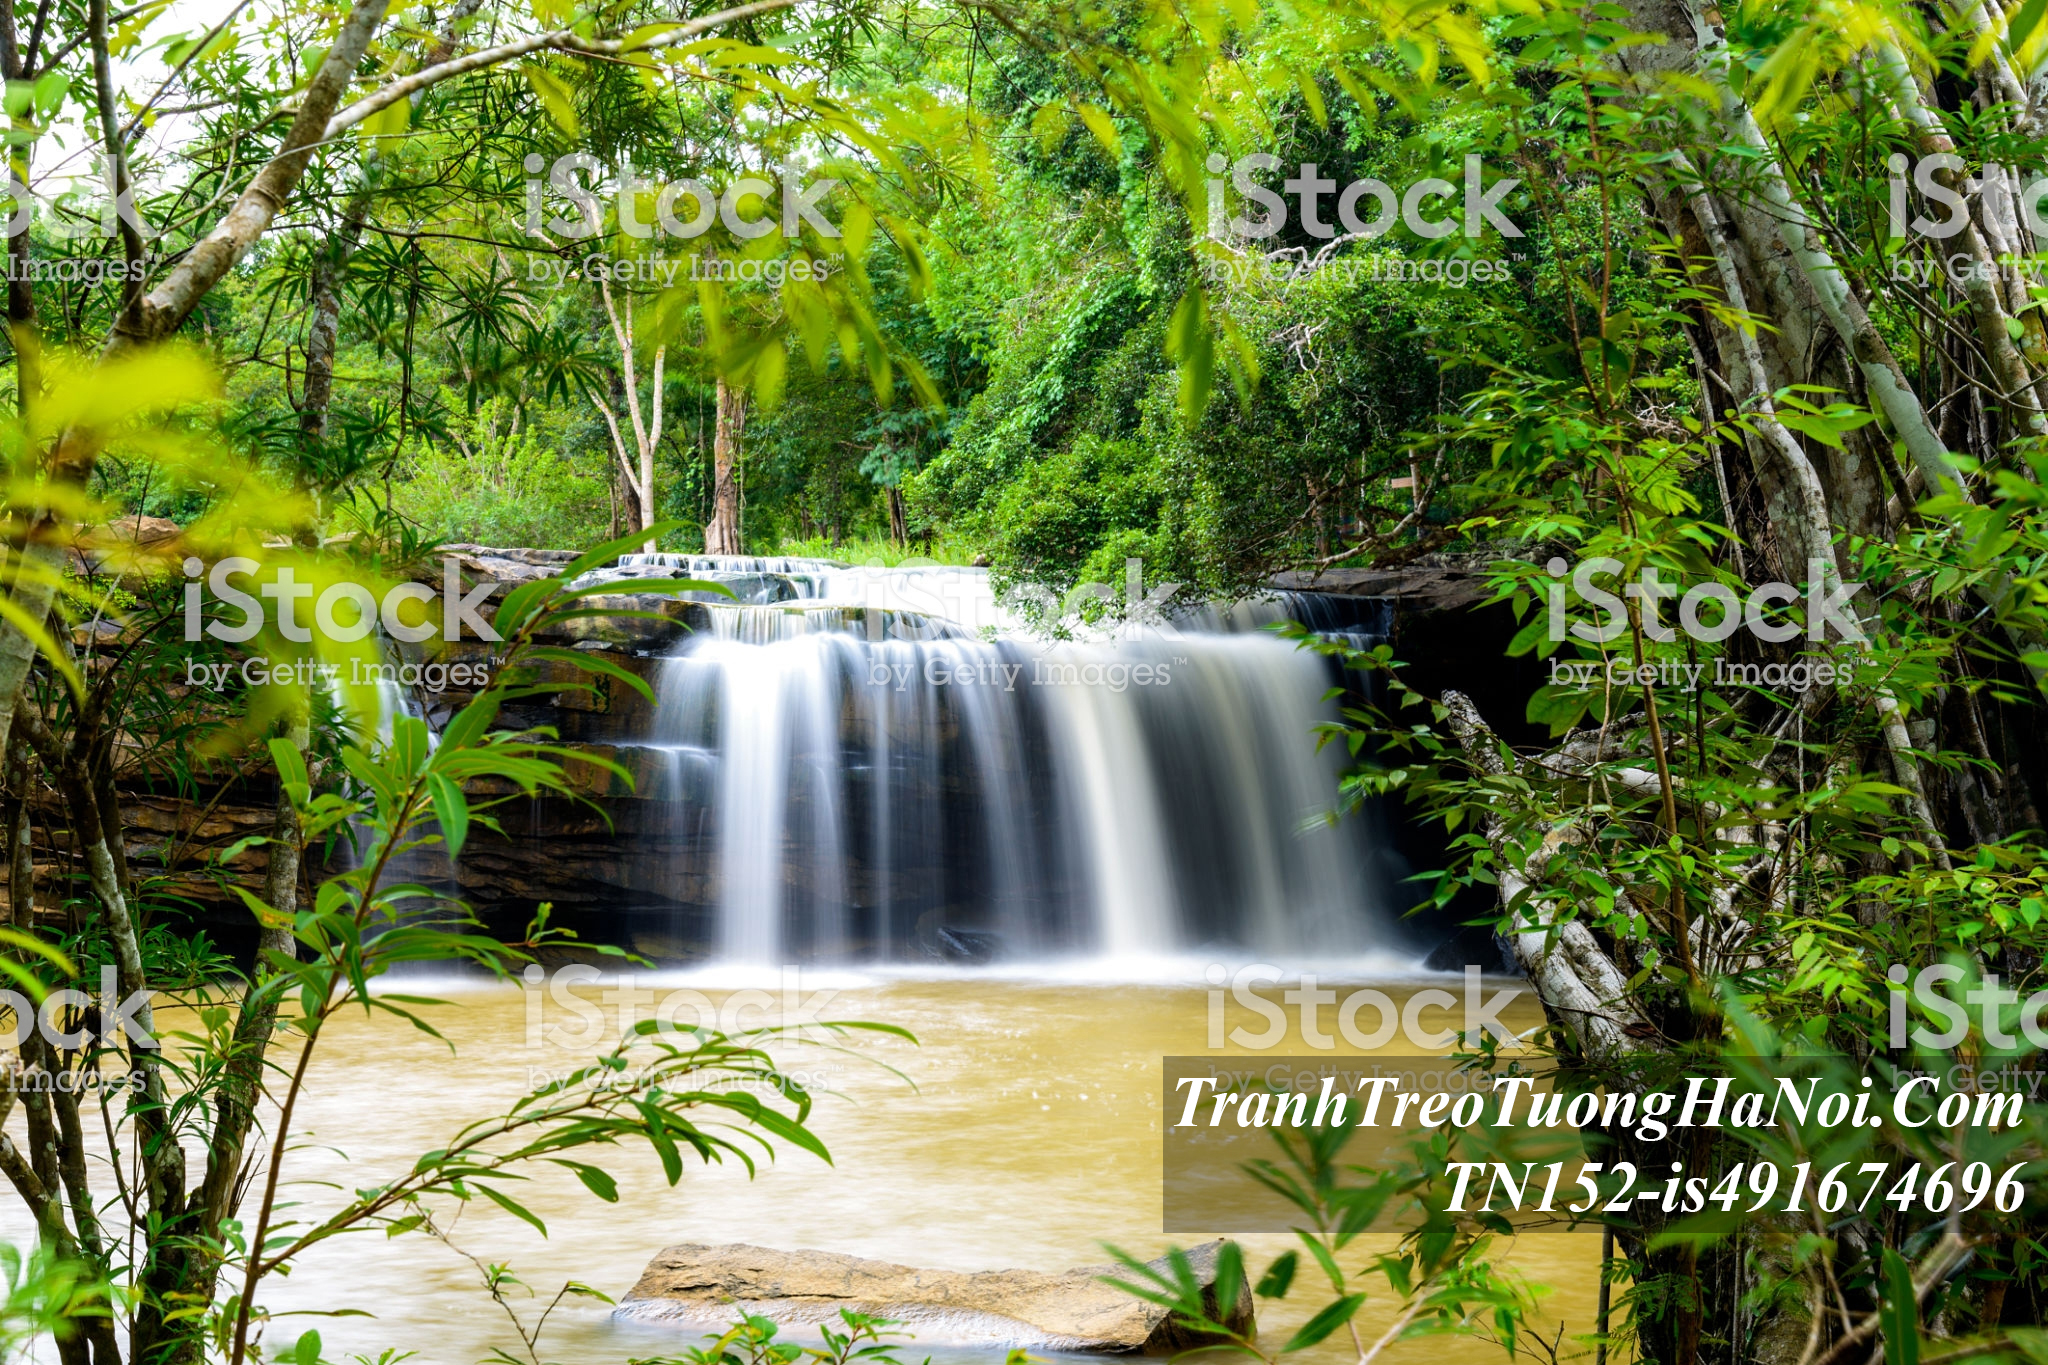 Phong canh dep thac nuoc Wang Yai AmiA TN152-is491674696